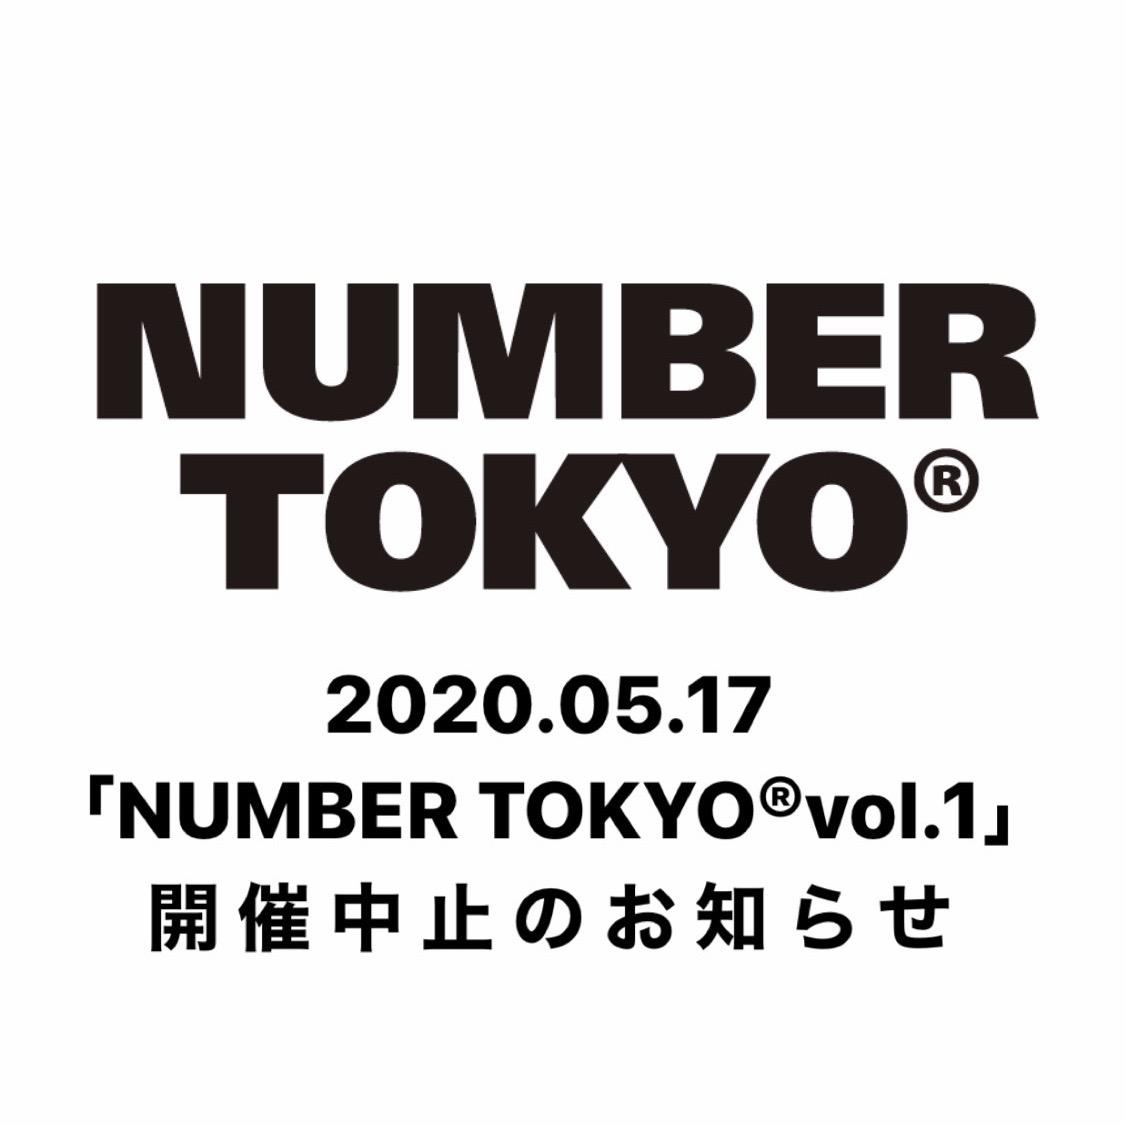 2020.05.17「NUMBER TOKYO®︎vol.1」開催中止のお知らせ